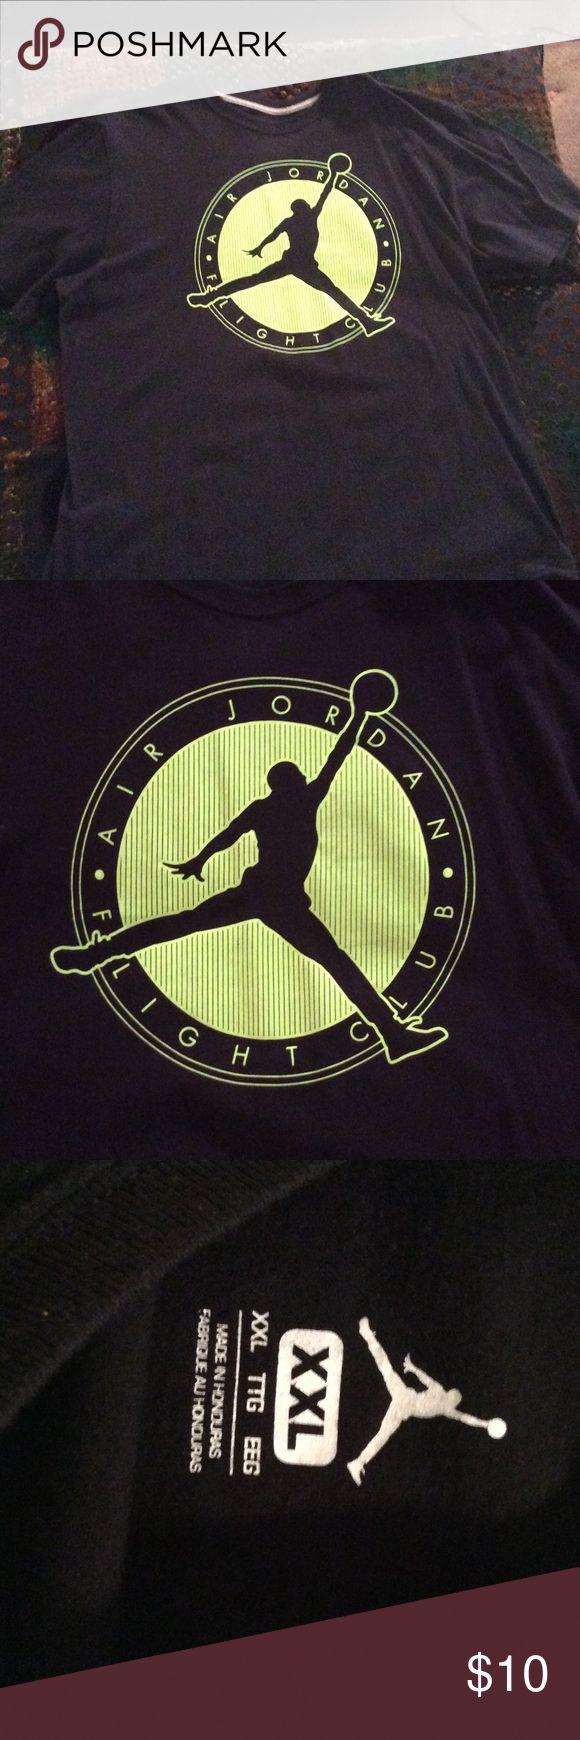 Air Jordan Flight Club Tee Shirt Worn once. Excellent Condition. Bundle with a pair of Jordan's!! Jordan Shirts Tees - Short Sleeve